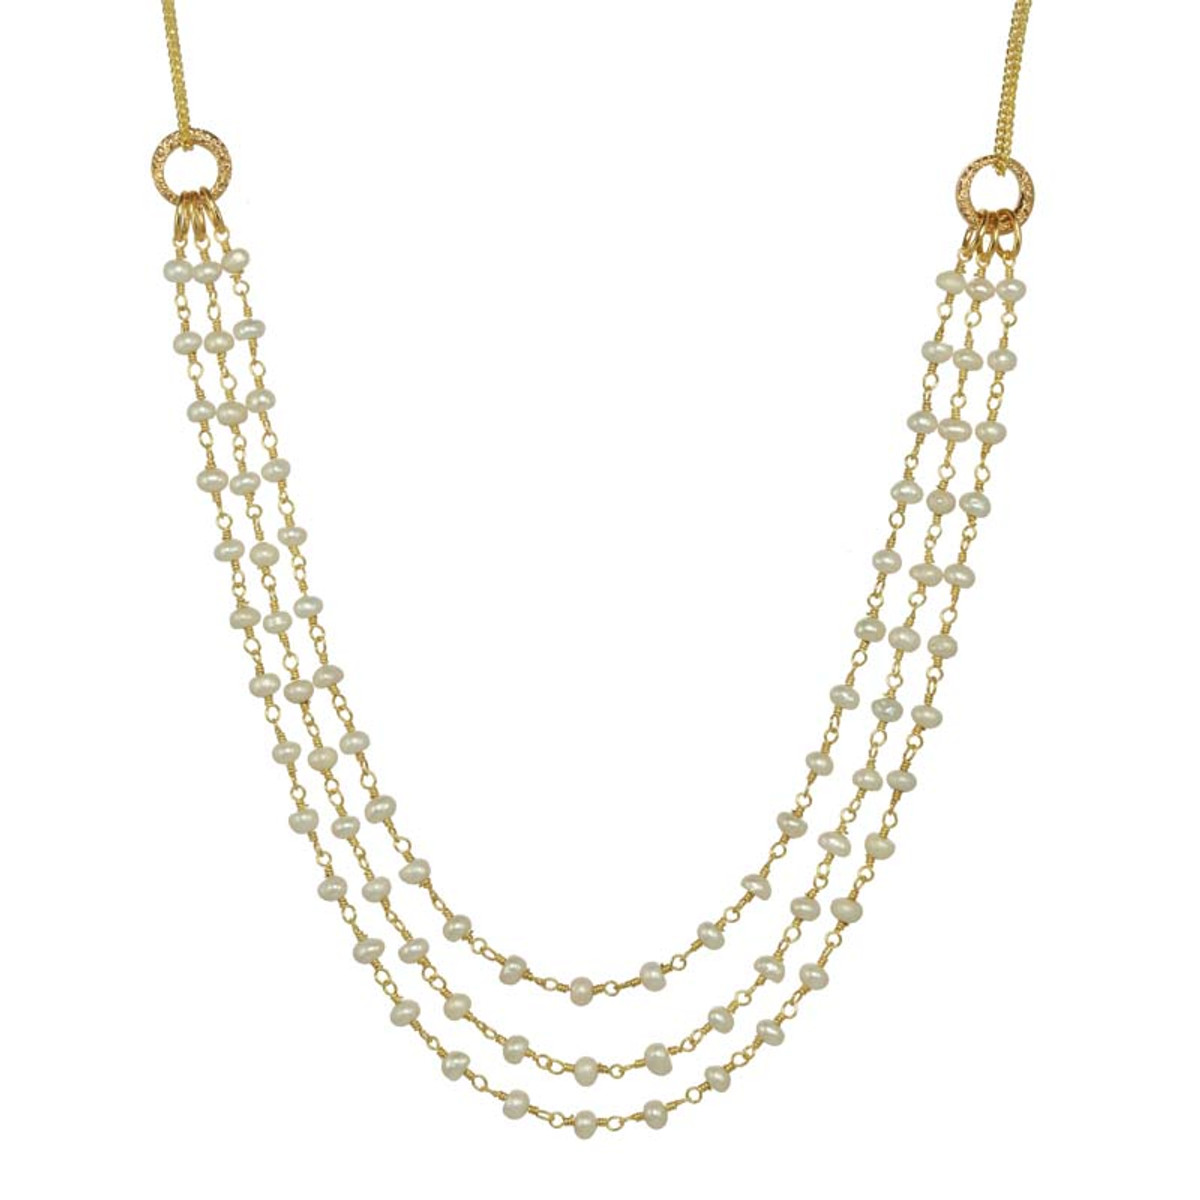 White Michal Golan Jewelry Elegante Style Necklace